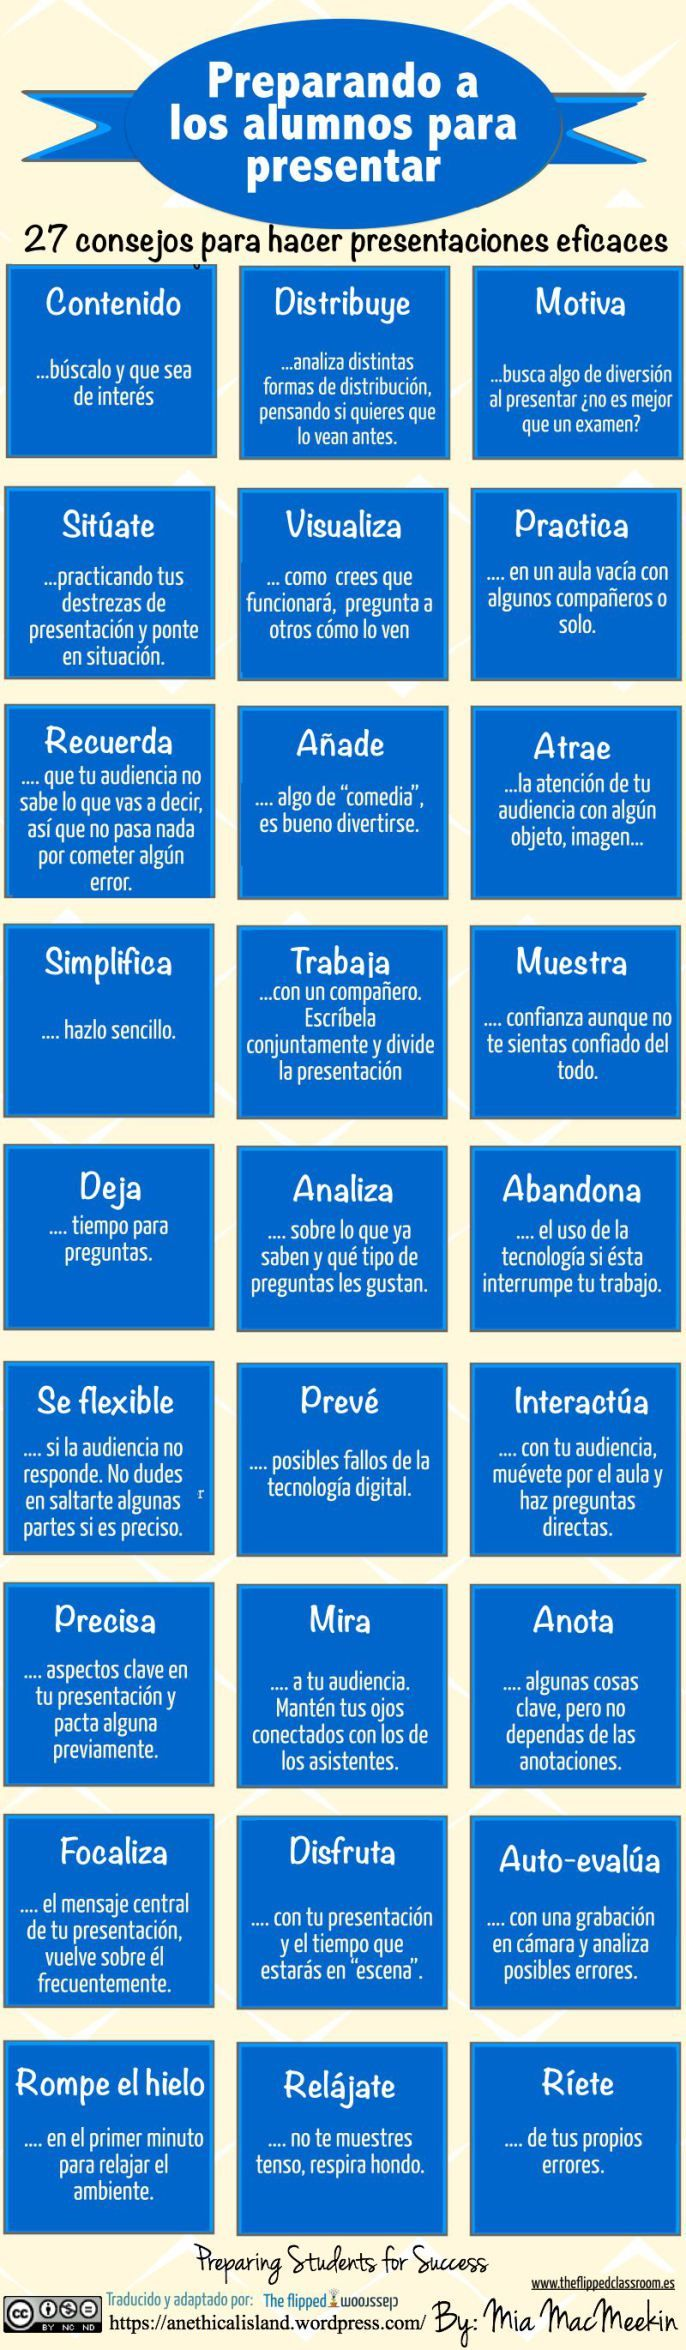 PresentacionesAula27TipsProducirlas-Infografía-BlogGesvin